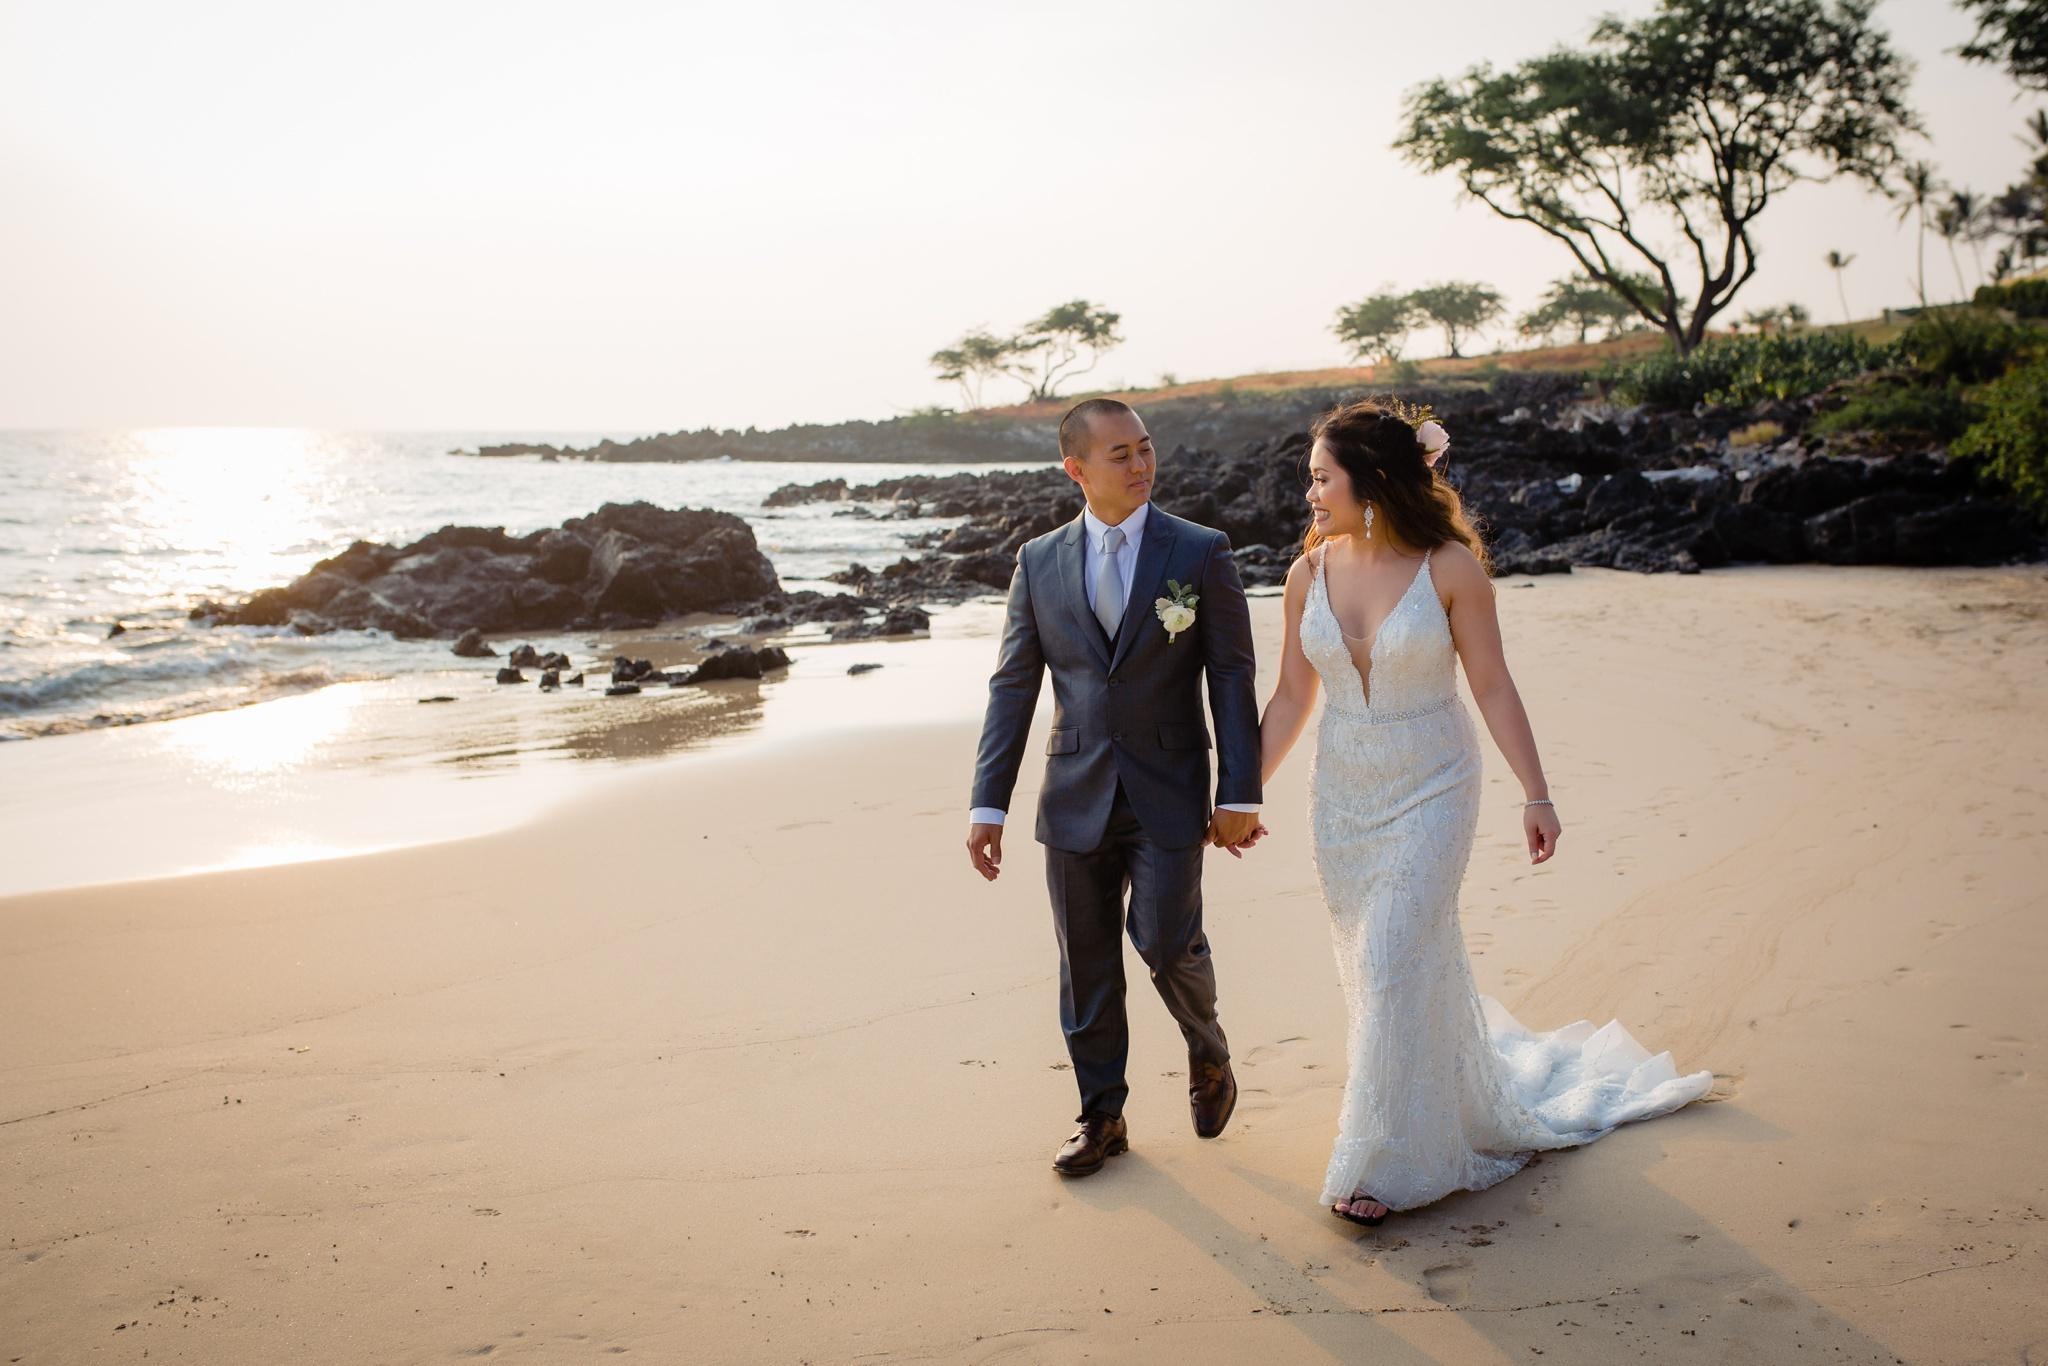 wedding couple walking hand in hand on sandy beach in hawaii